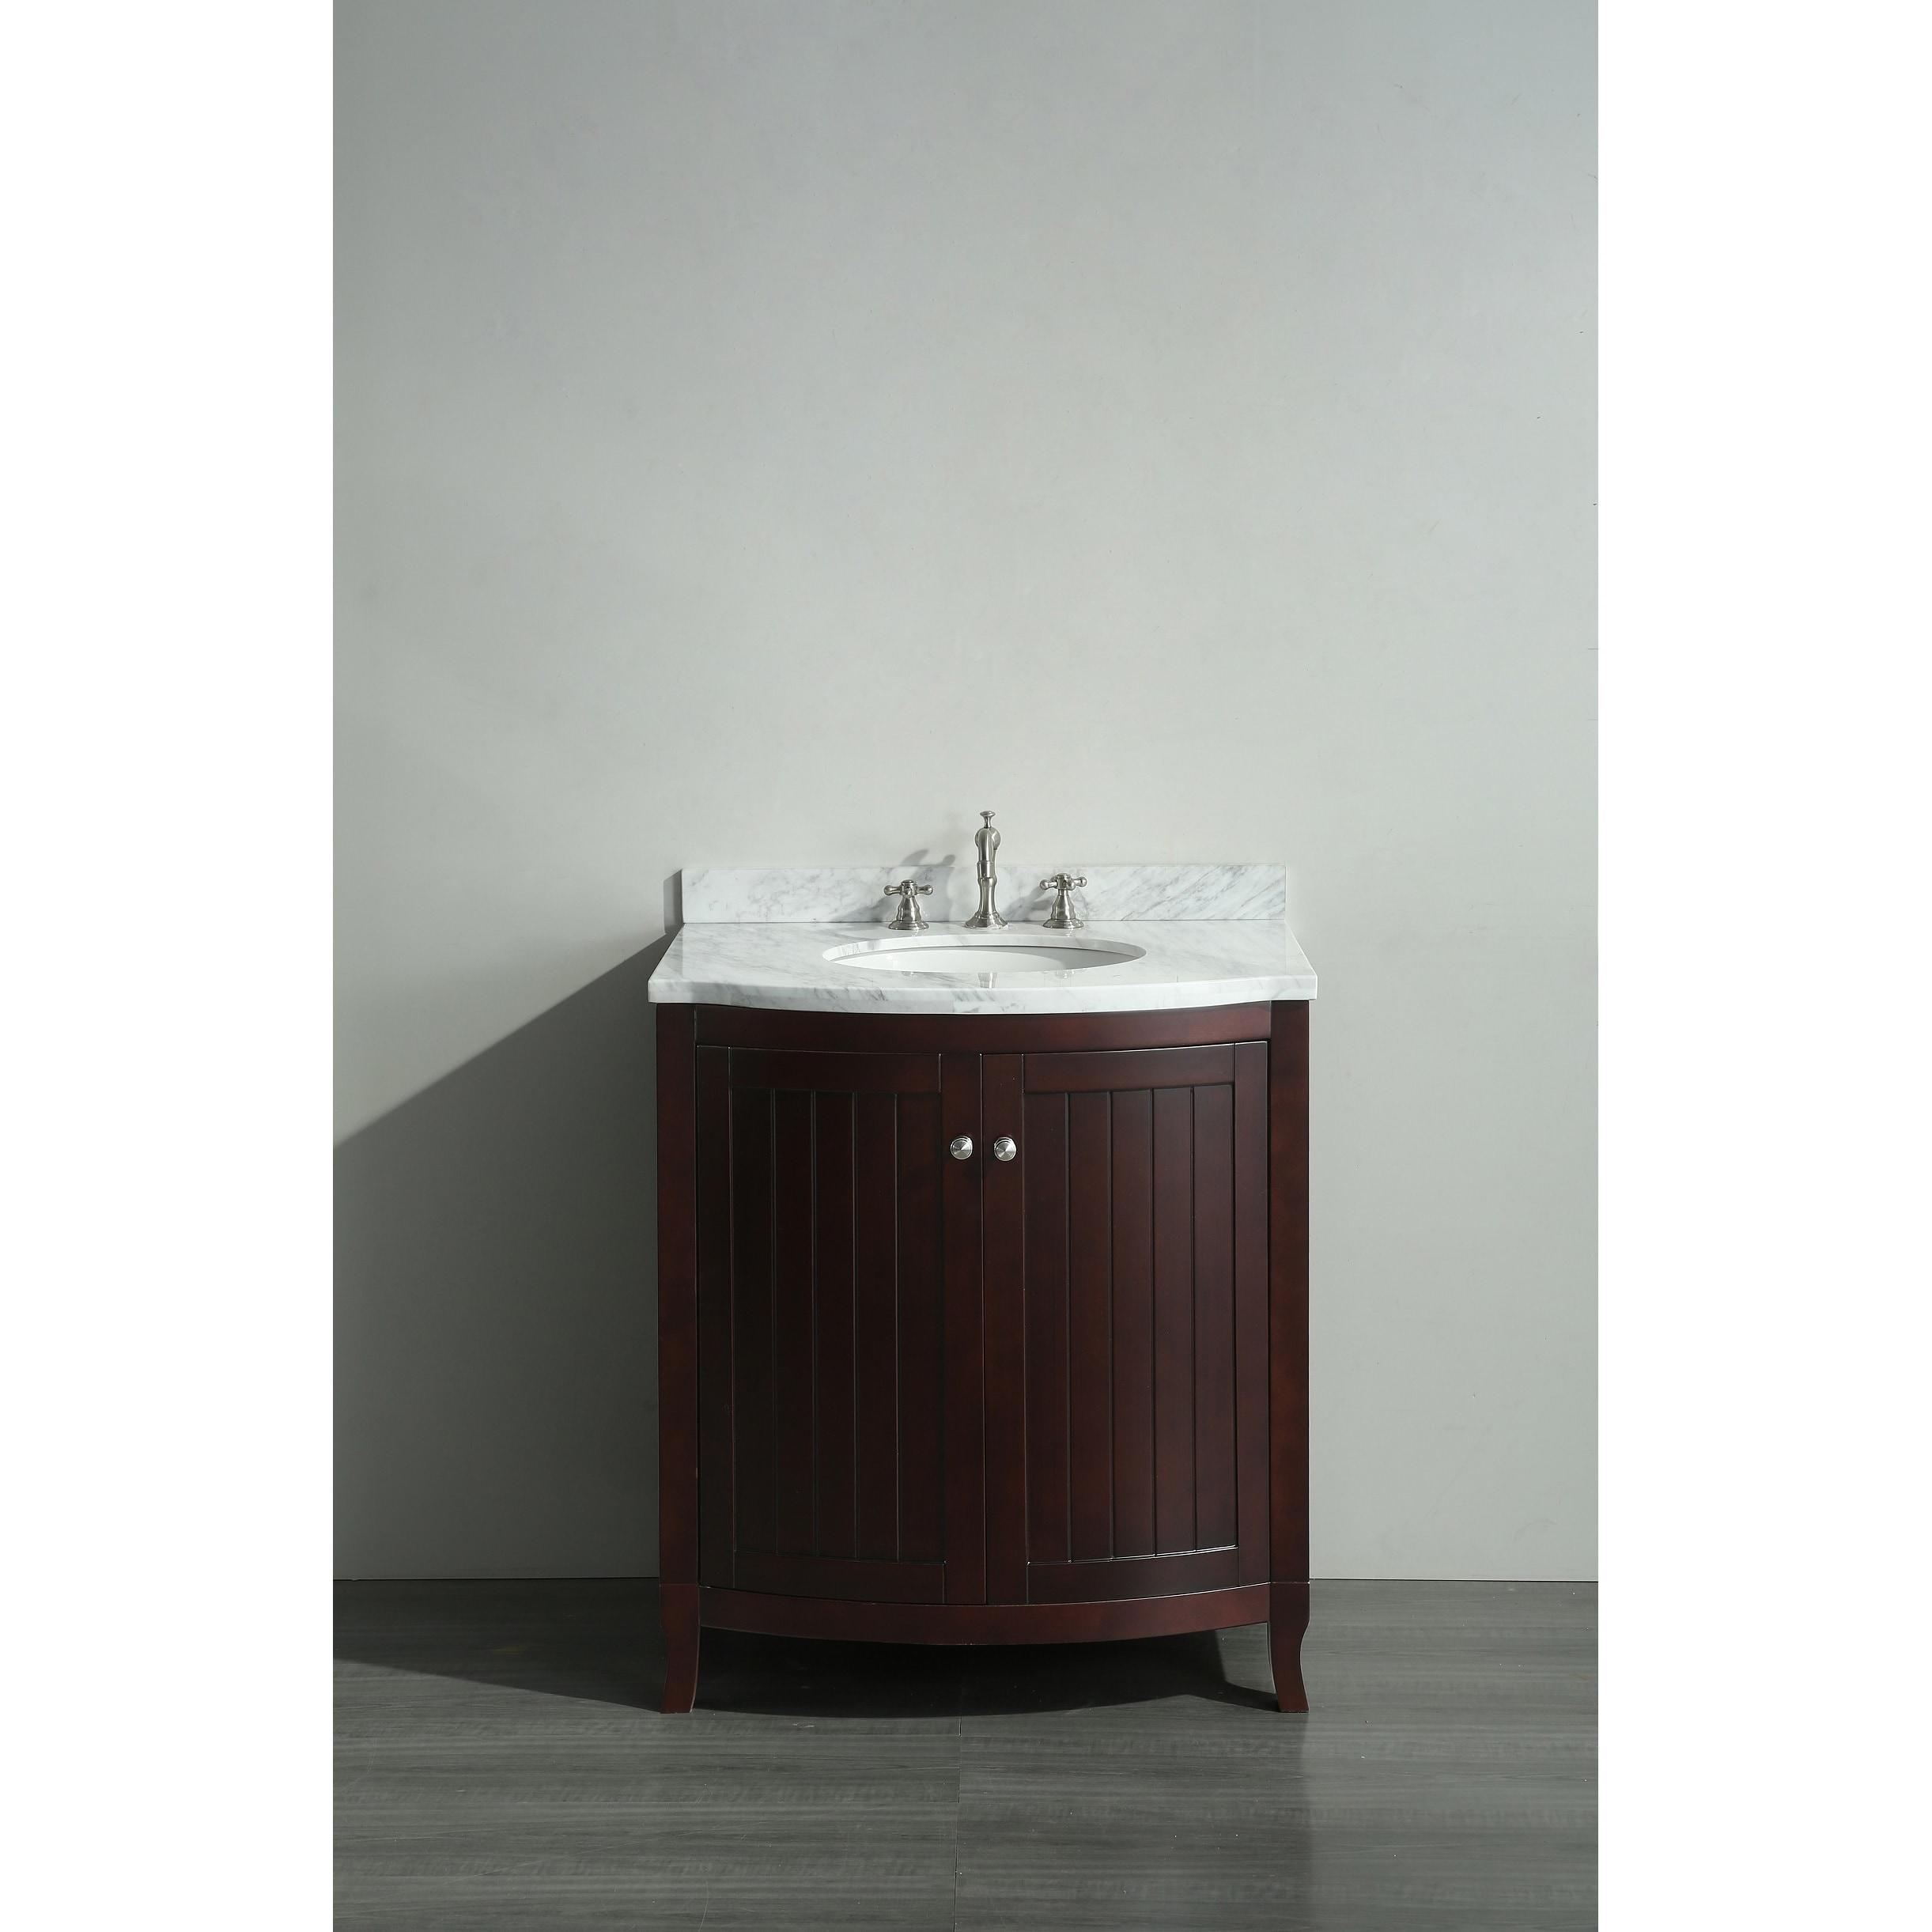 Eviva Odessa Zinx Dark Teak 30-inch Bathroom Vanity with White ...